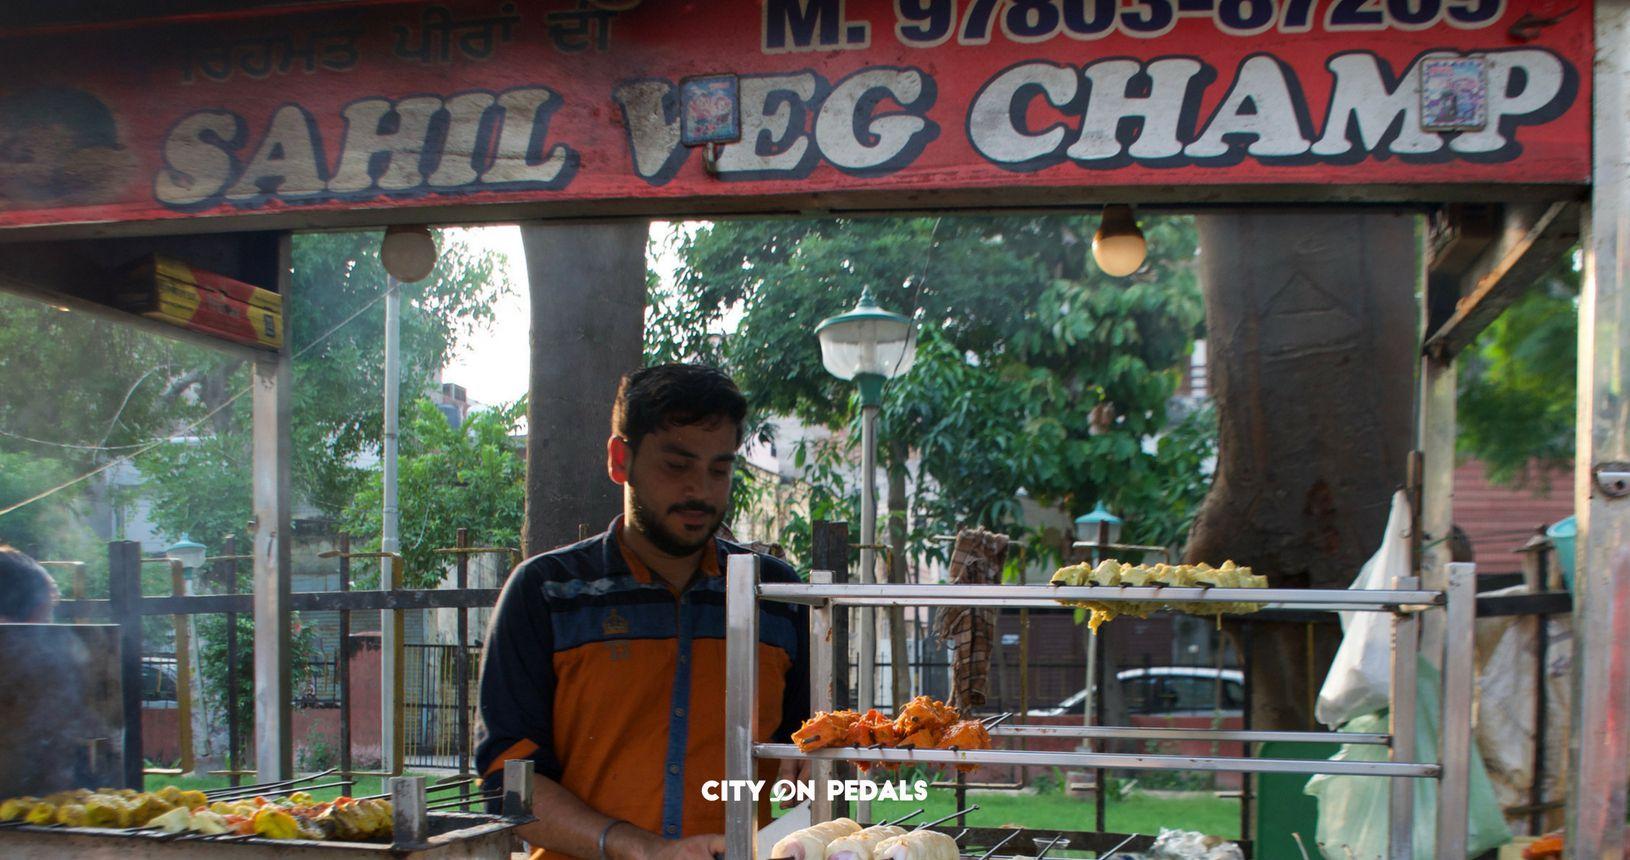 Sahil Veg Champ - Street Food in Rani Ka Bagh Amritsar